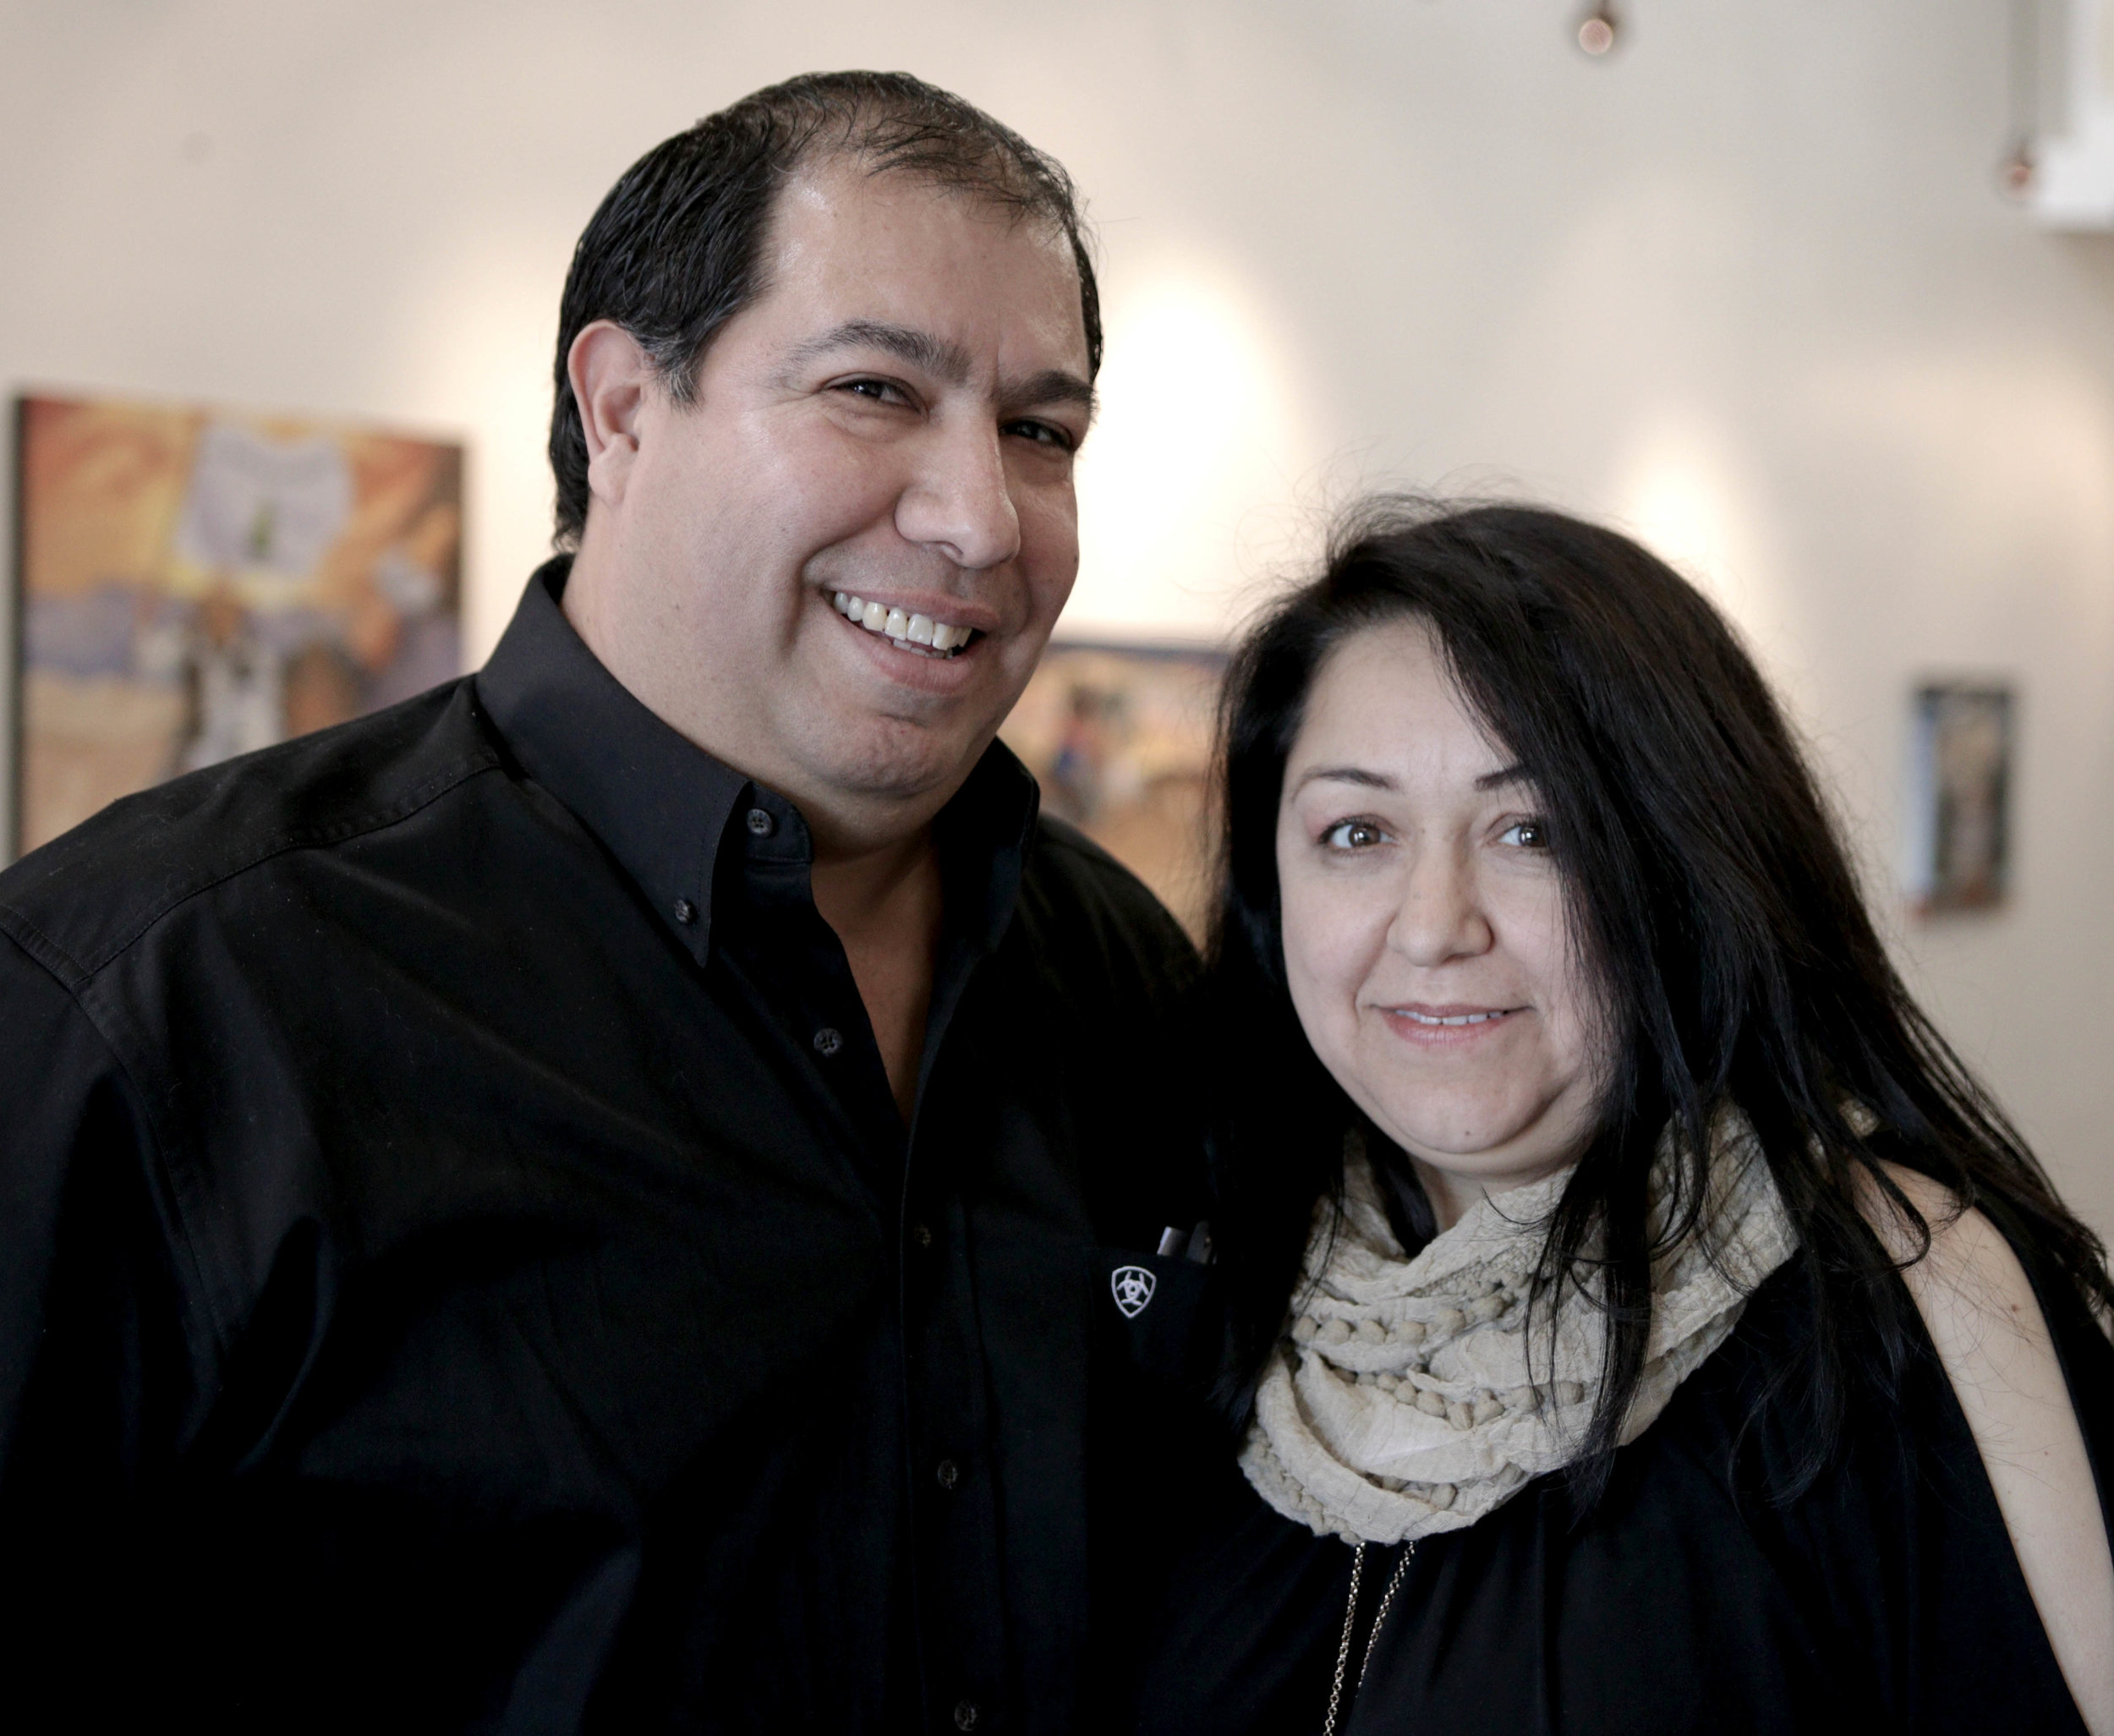 Ismael & Verónica Cisneros - Associate Pastors